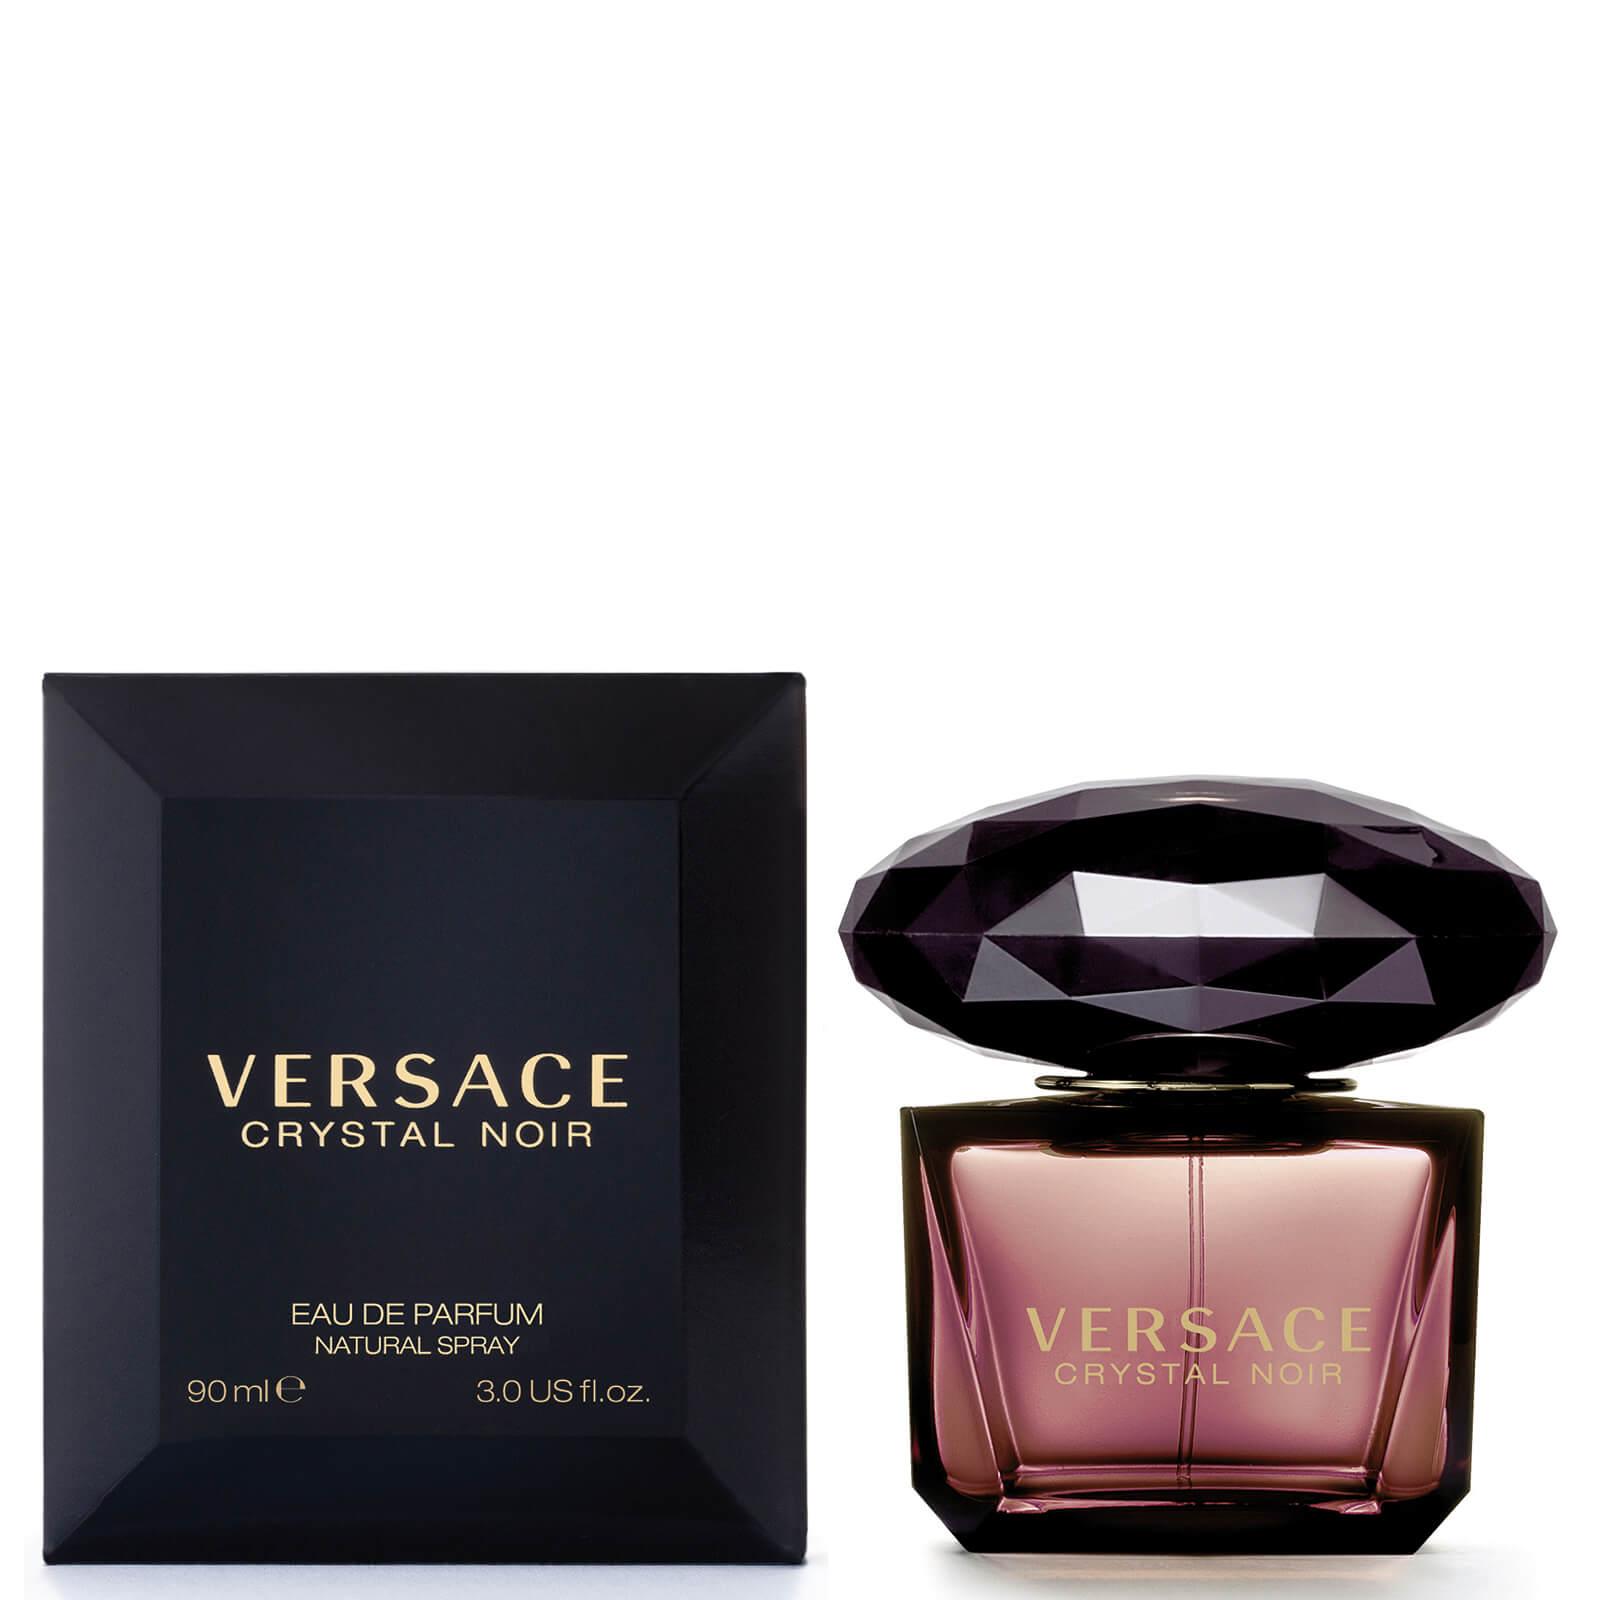 Spray Versace Crystal Noir Eau de Parfum 90 ml